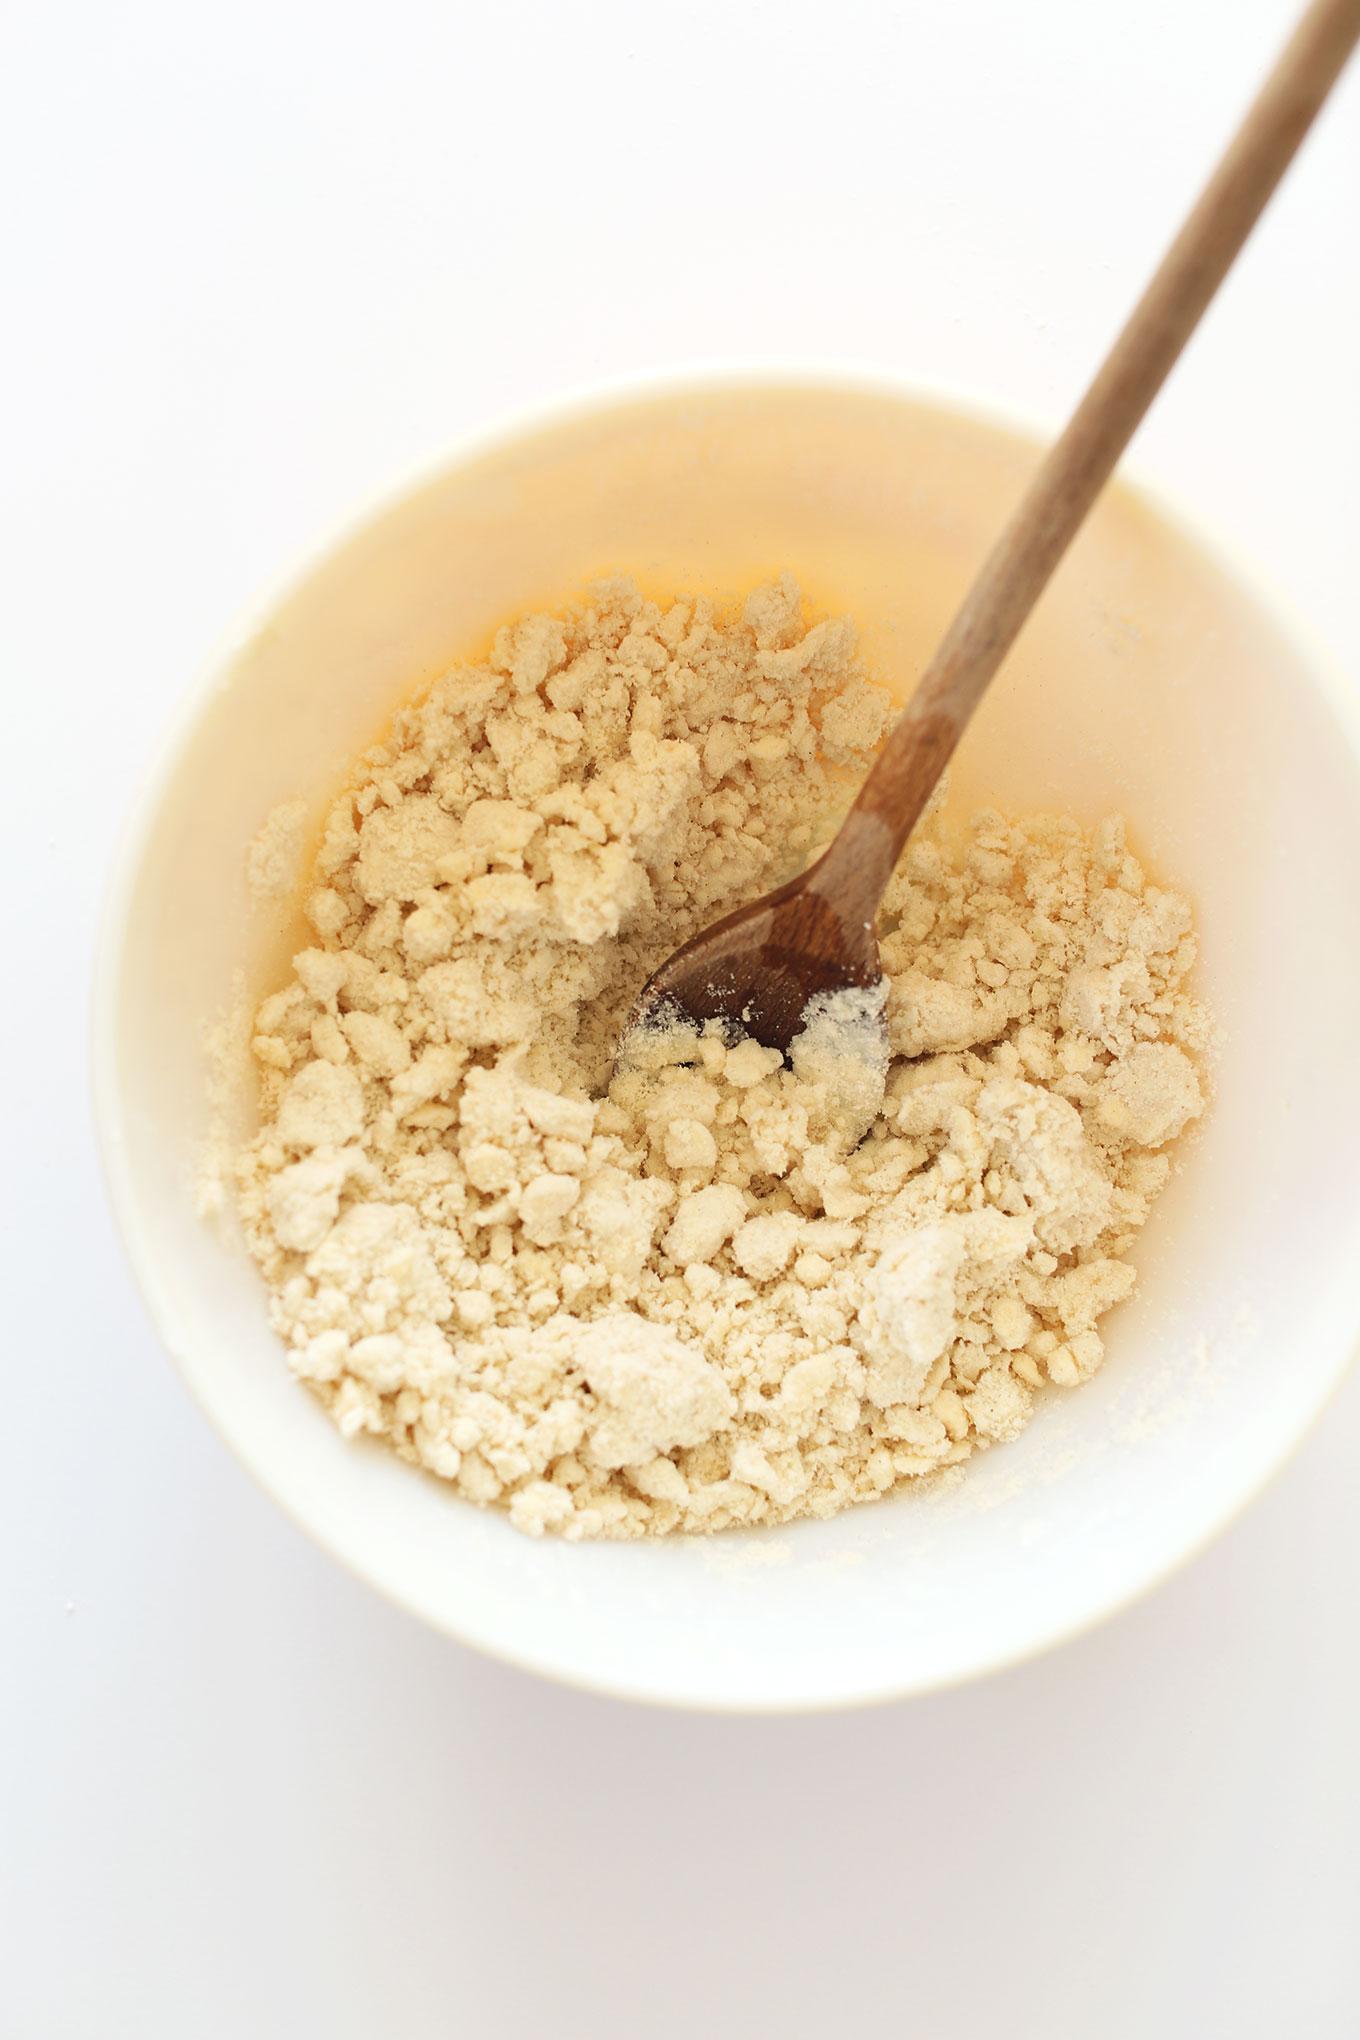 Bowl of gluten-free pie crust dough